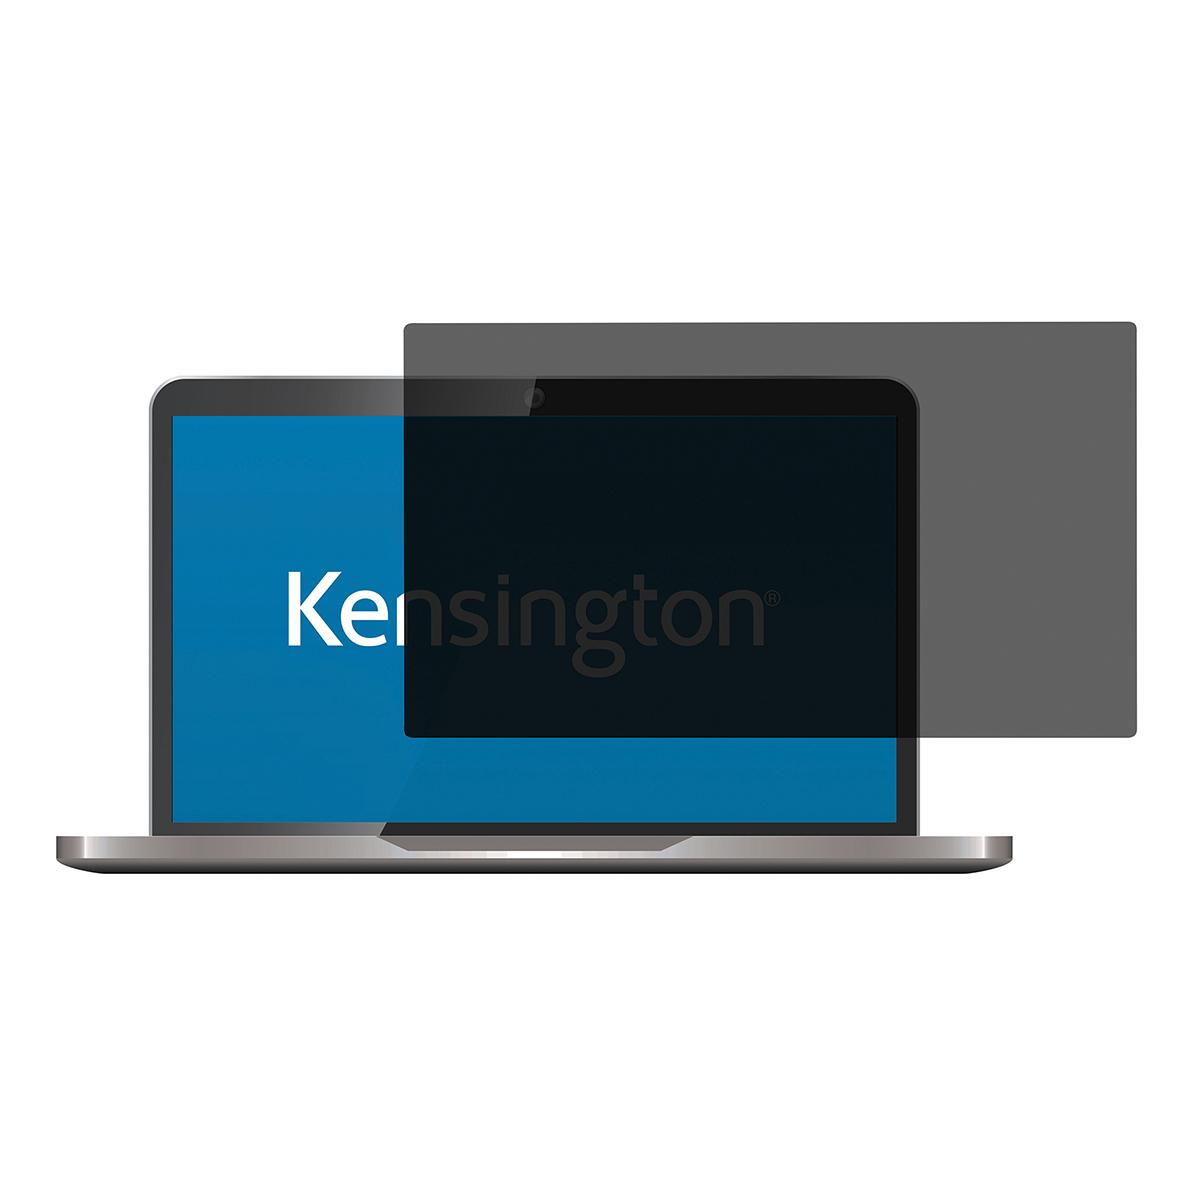 Kensington 626382 Privacy Filter 2 Way Adhesive for HP EliteBook X360 1030 G2